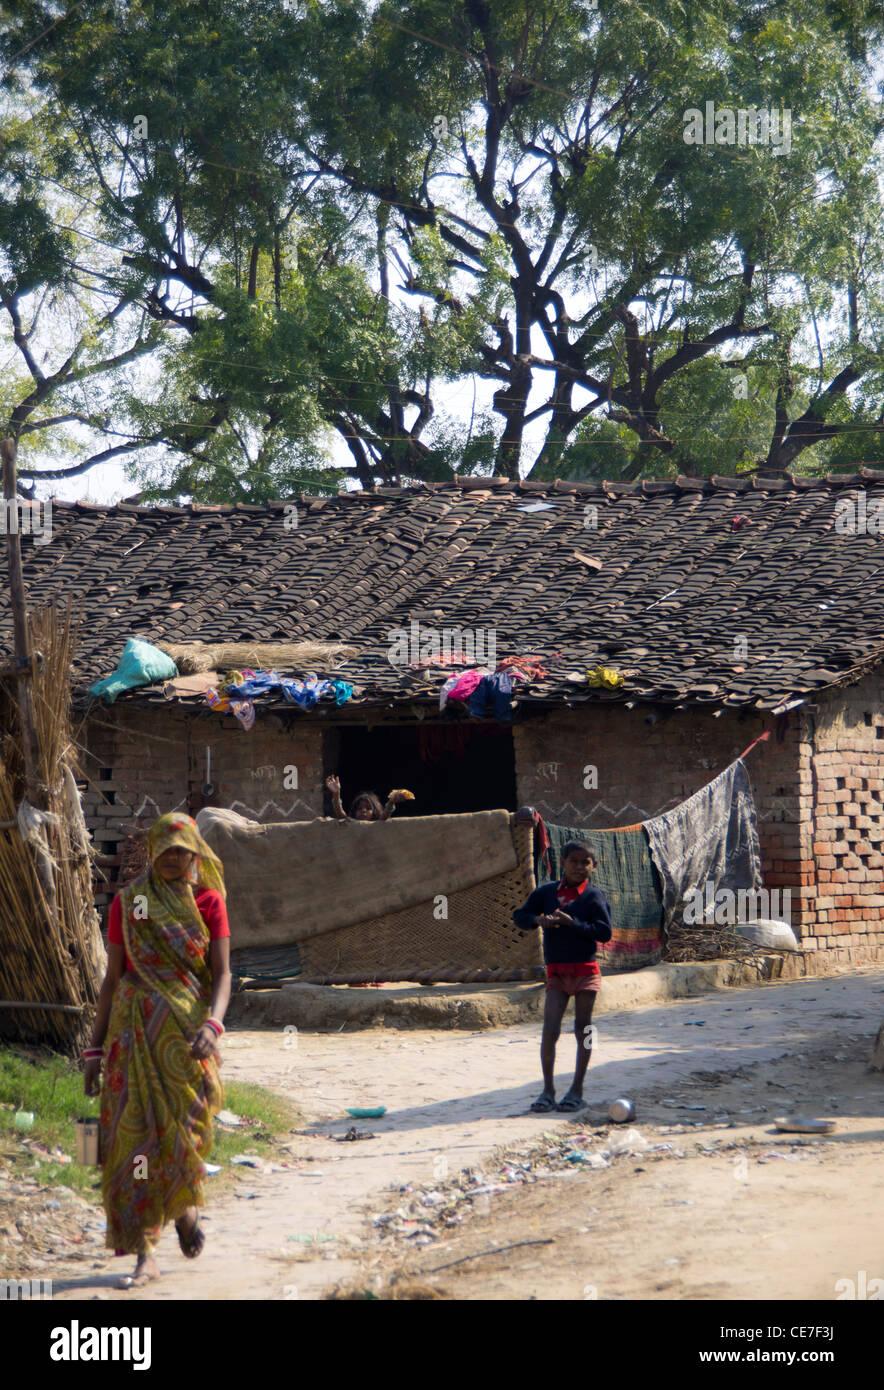 Indian Village Woman Stock Photos & Indian Village Woman